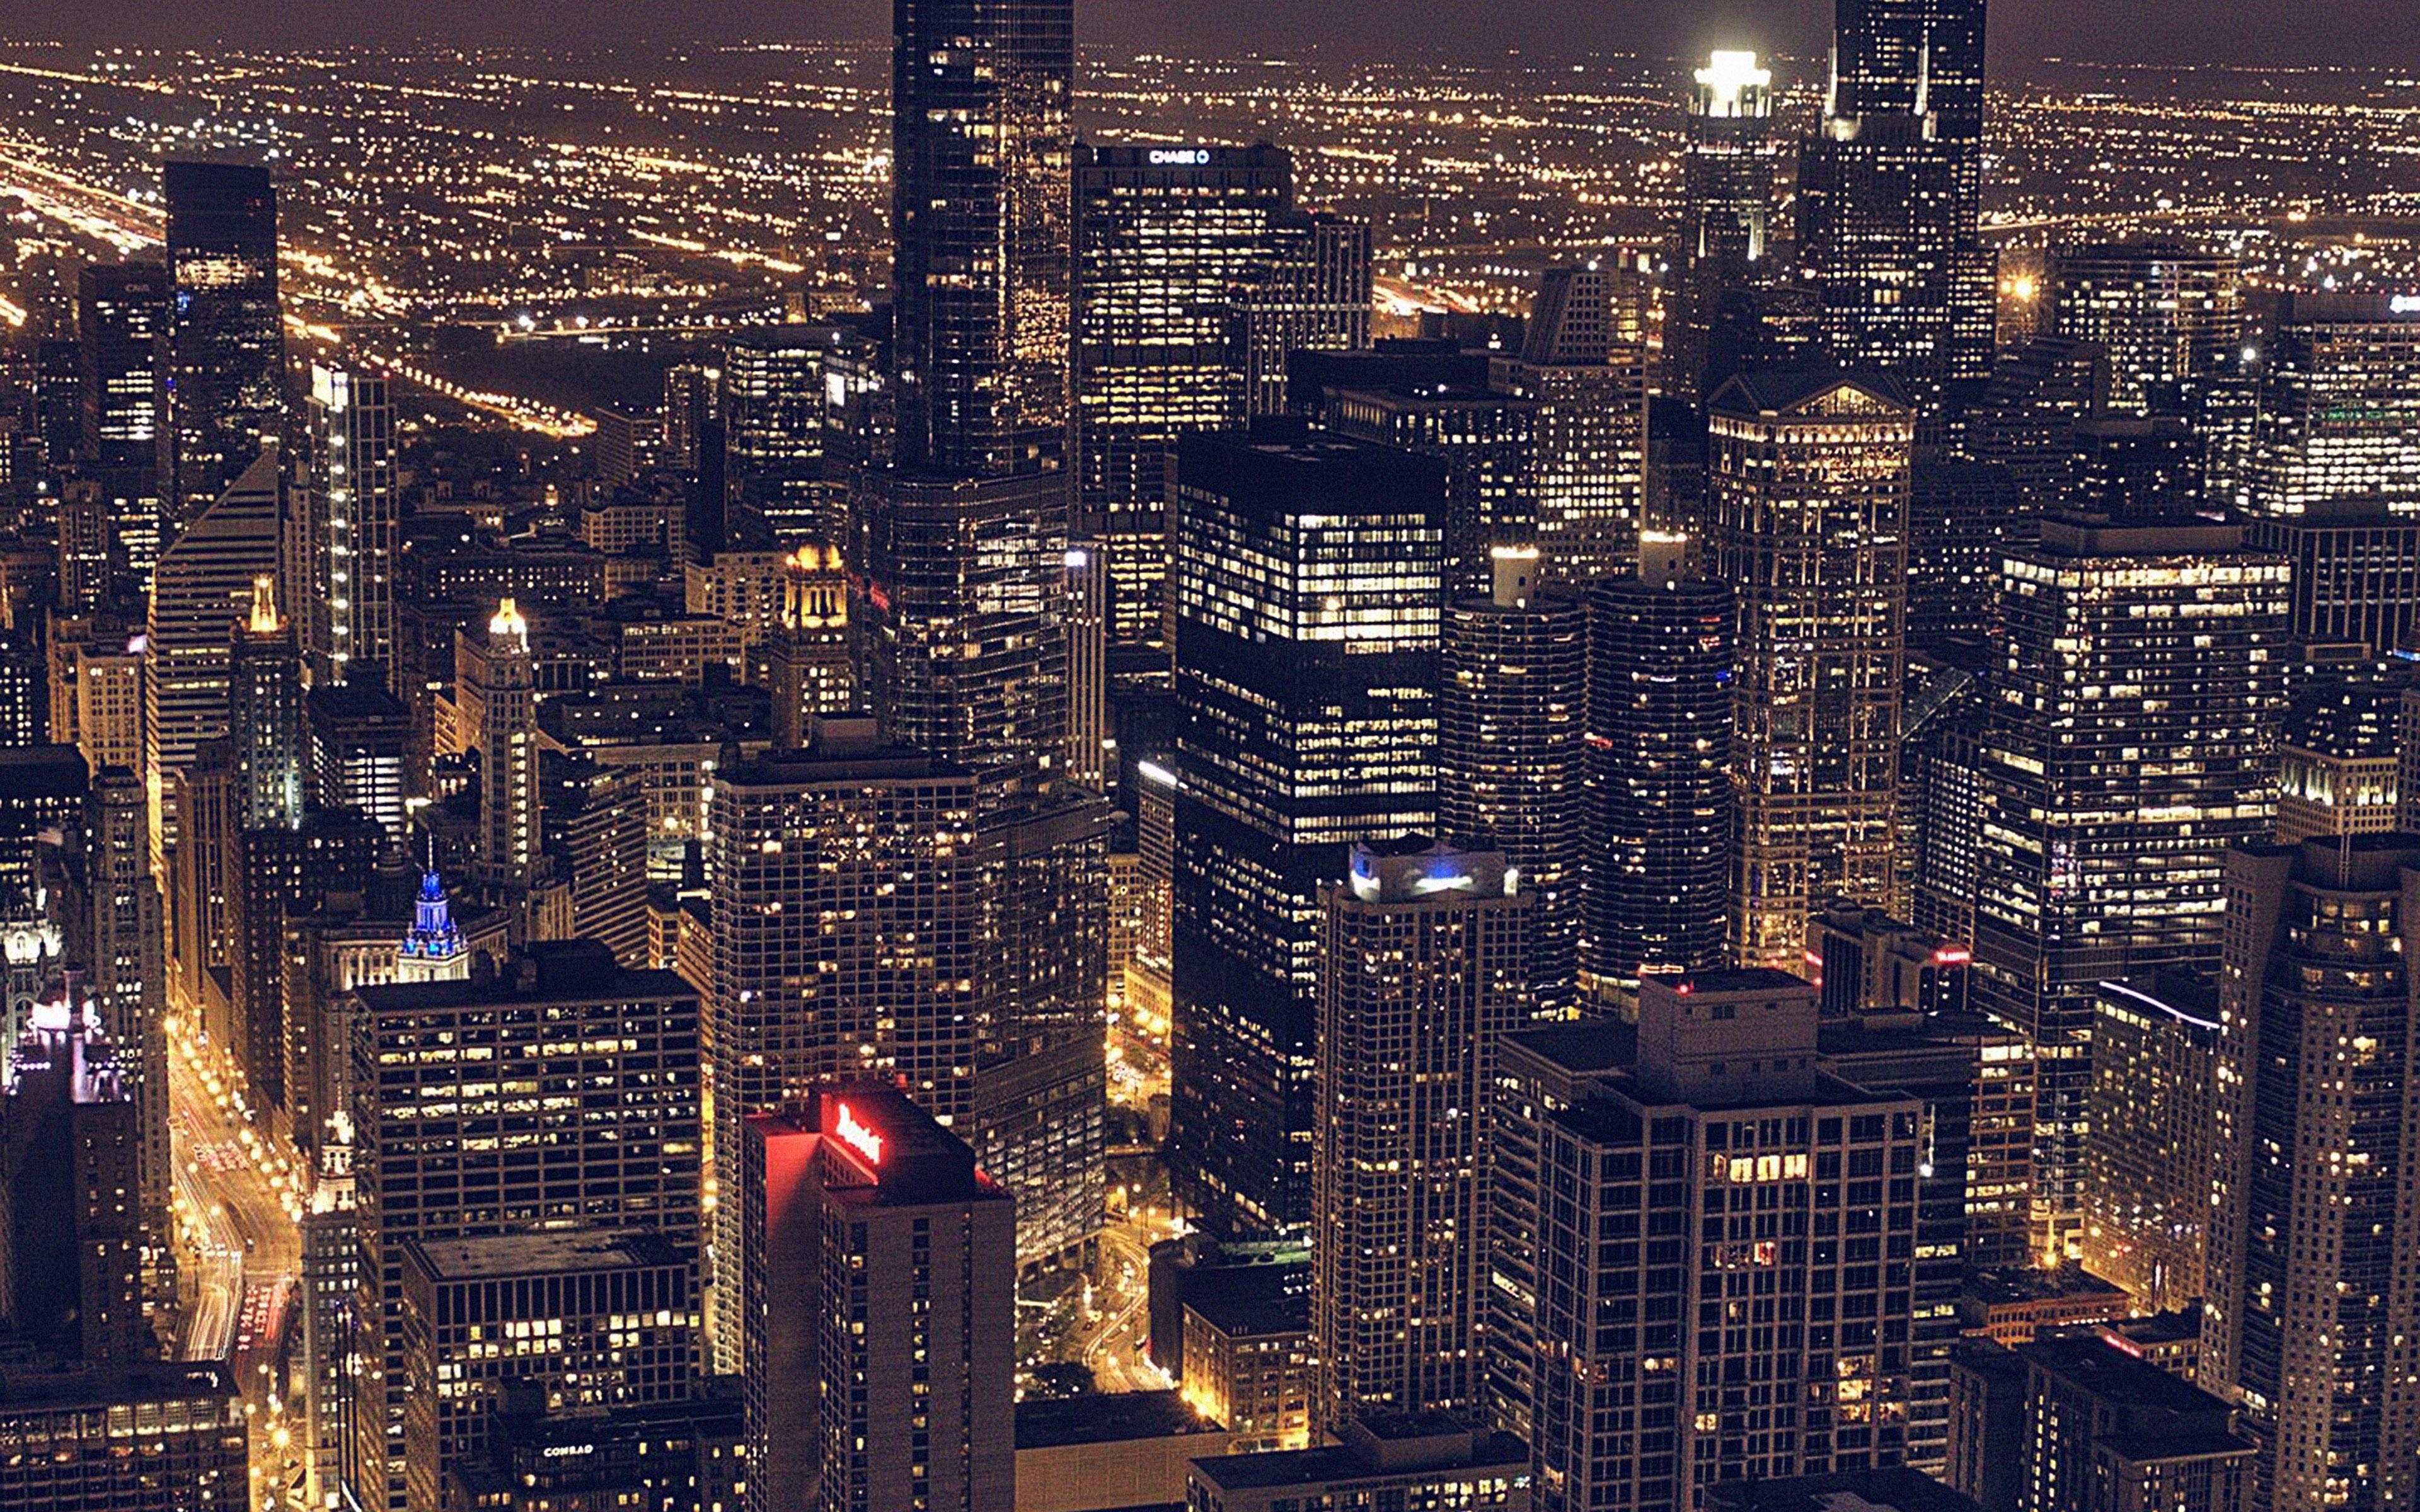 3d Wallpaper City Lights Ml83 City View Night Dark Papers Co